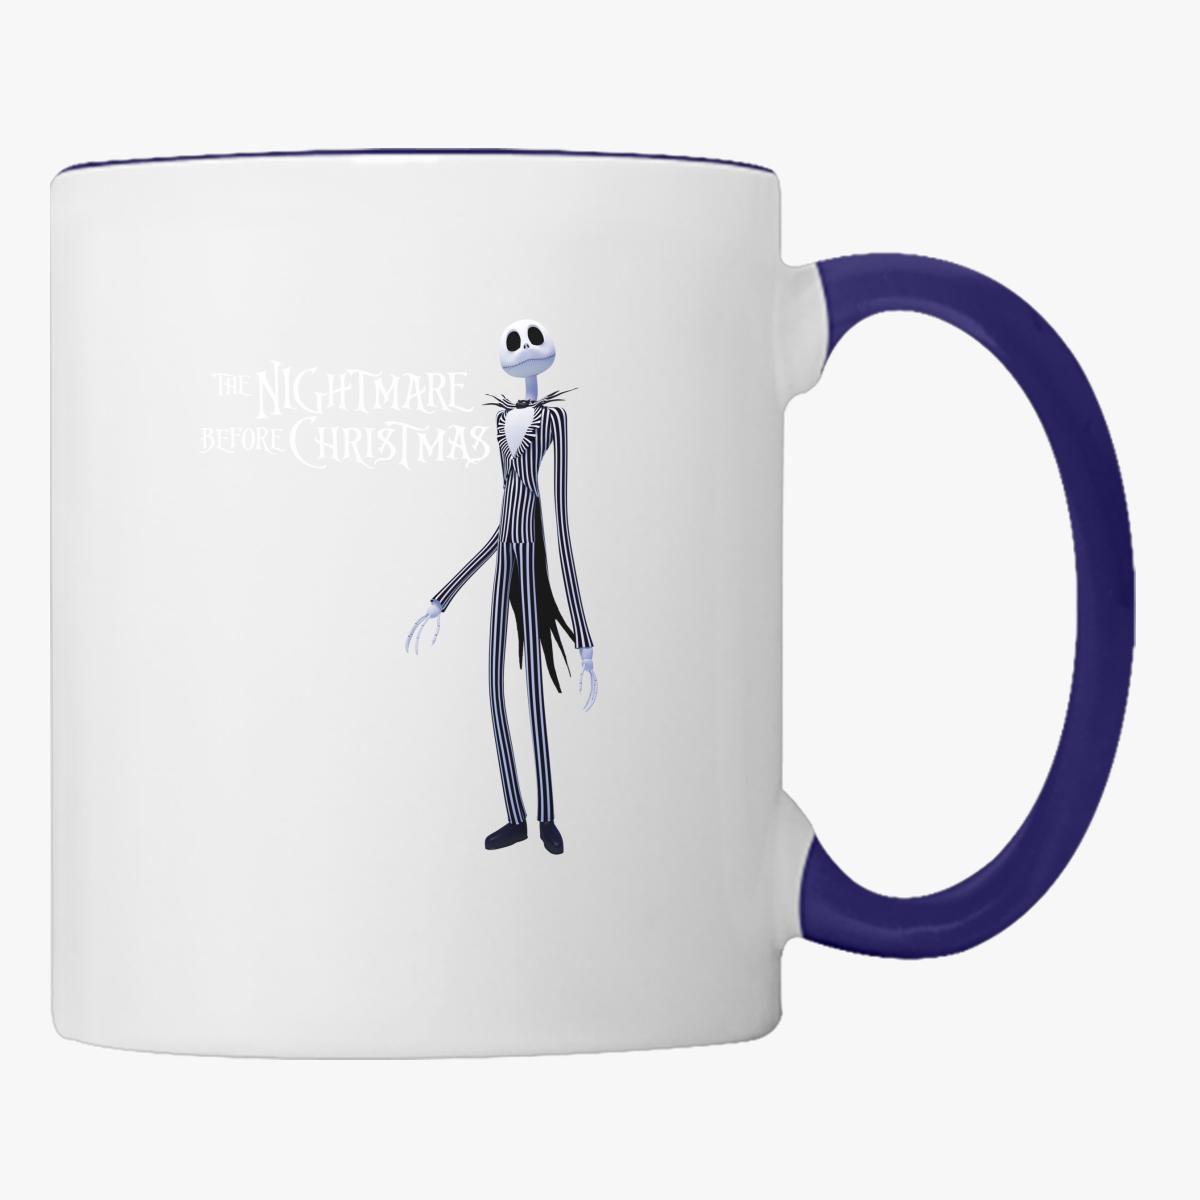 Nightmare Before Christmas Coffee Mug.The Nightmare Before Christmas Coffee Mug Customon